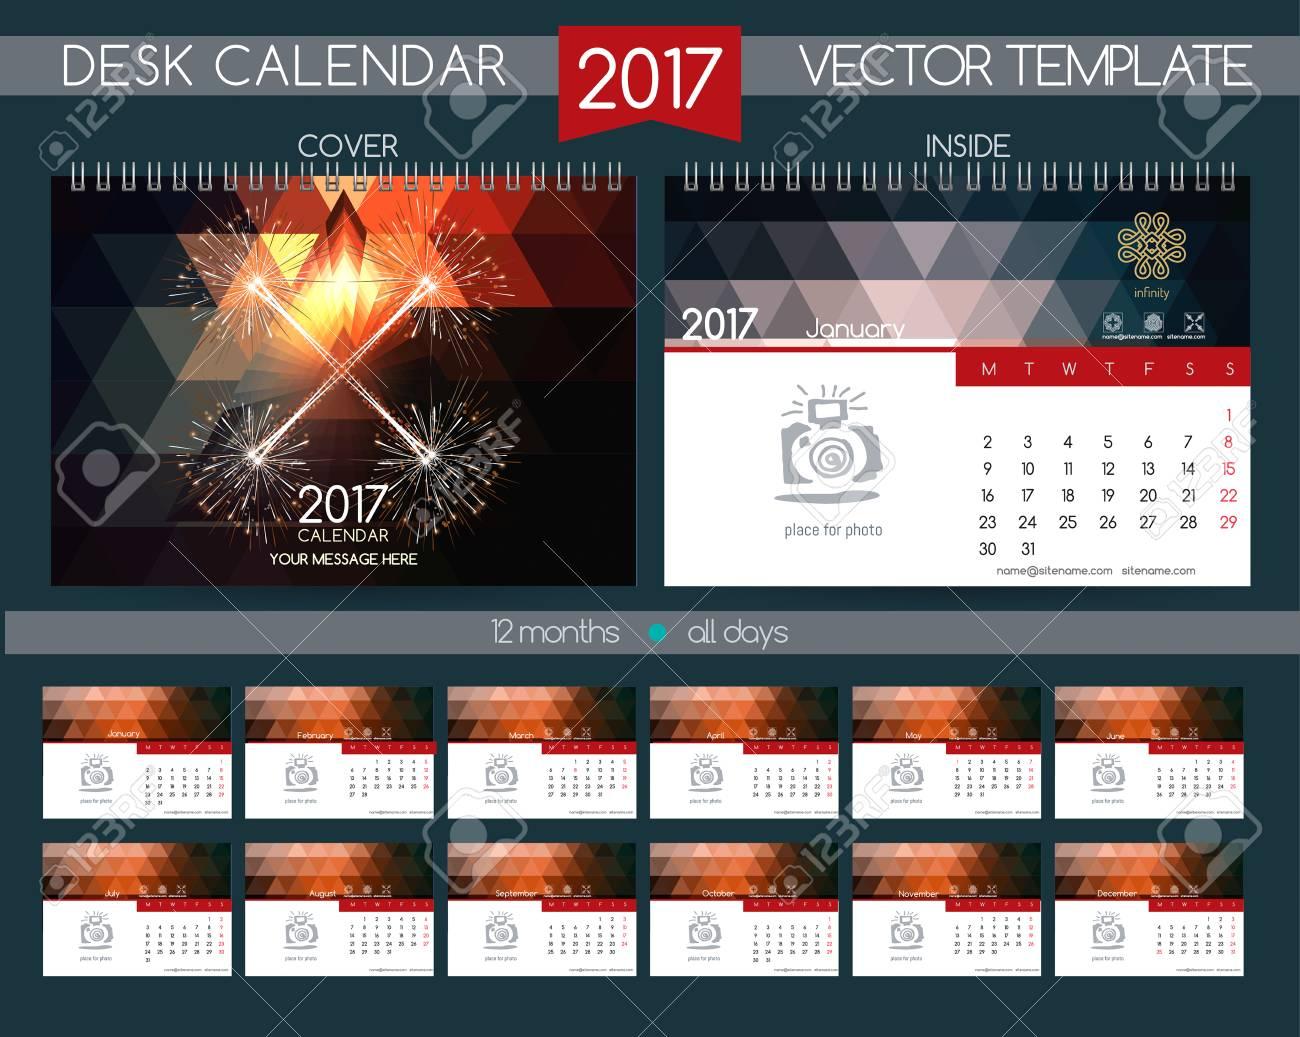 Calendar 2017. Vector Templates All Months. Colourful Festive ...